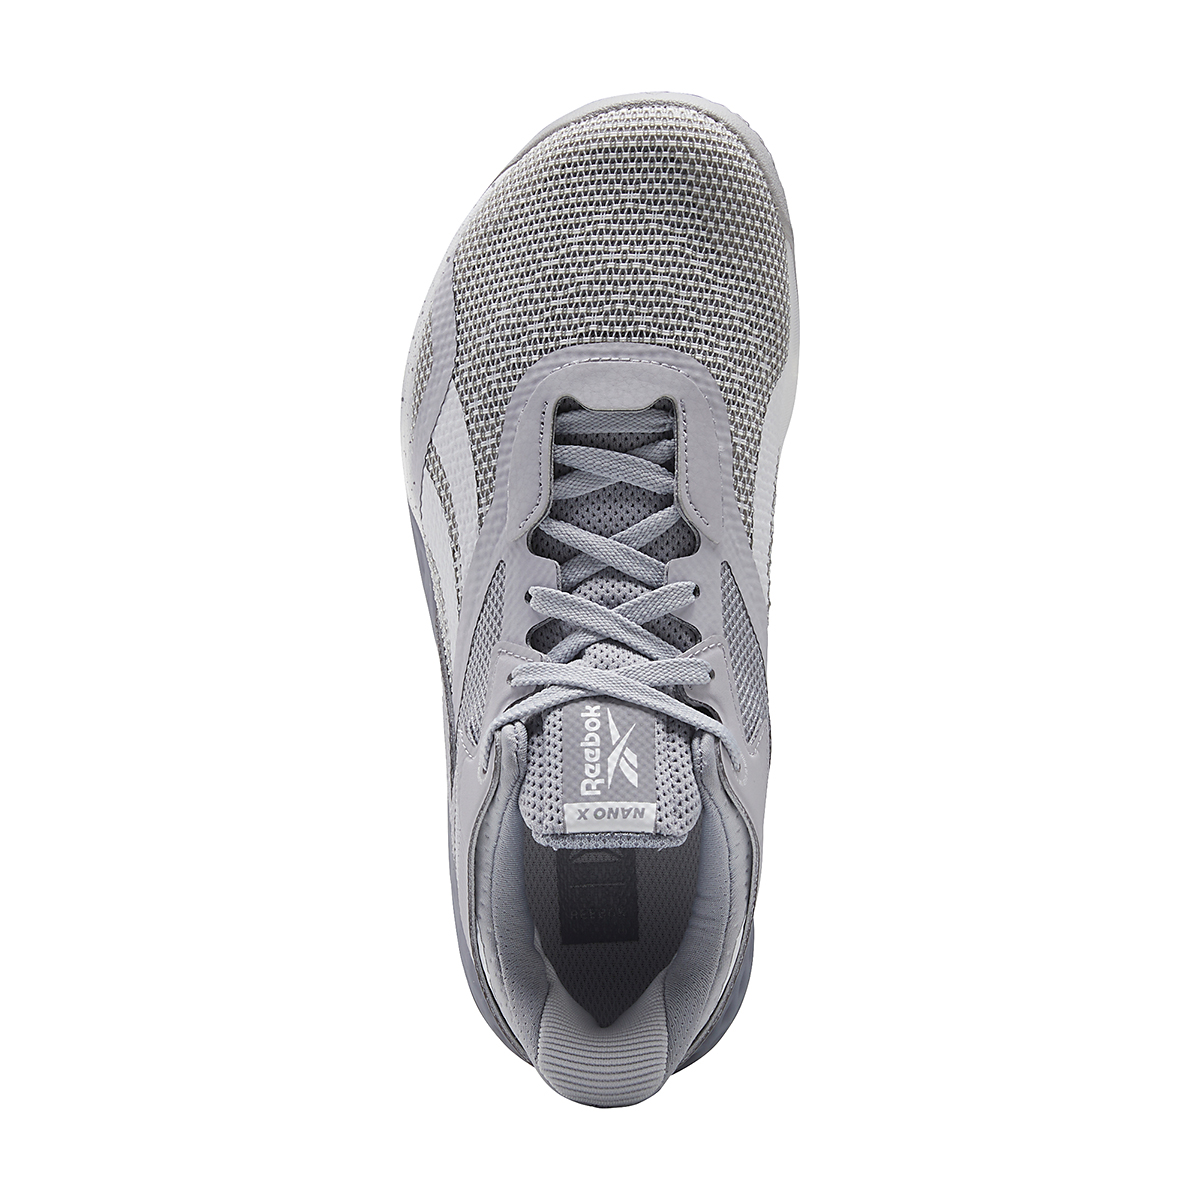 Women's Reebok Nano X Training Shoe - Color: Cold Grey/Cool Shadow/White - Size: 5 - Width: Regular, Cold Grey/Cool Shadow/White, large, image 7